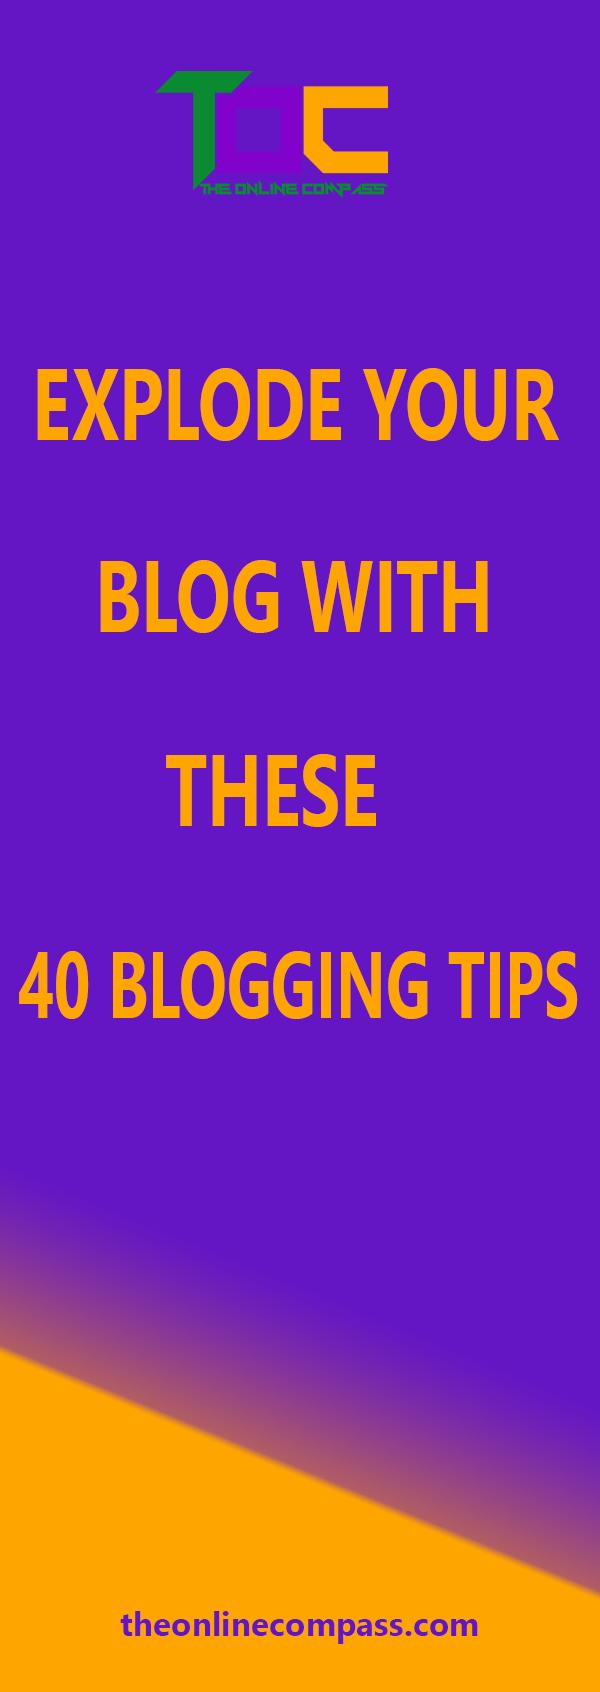 40 tips for blogging